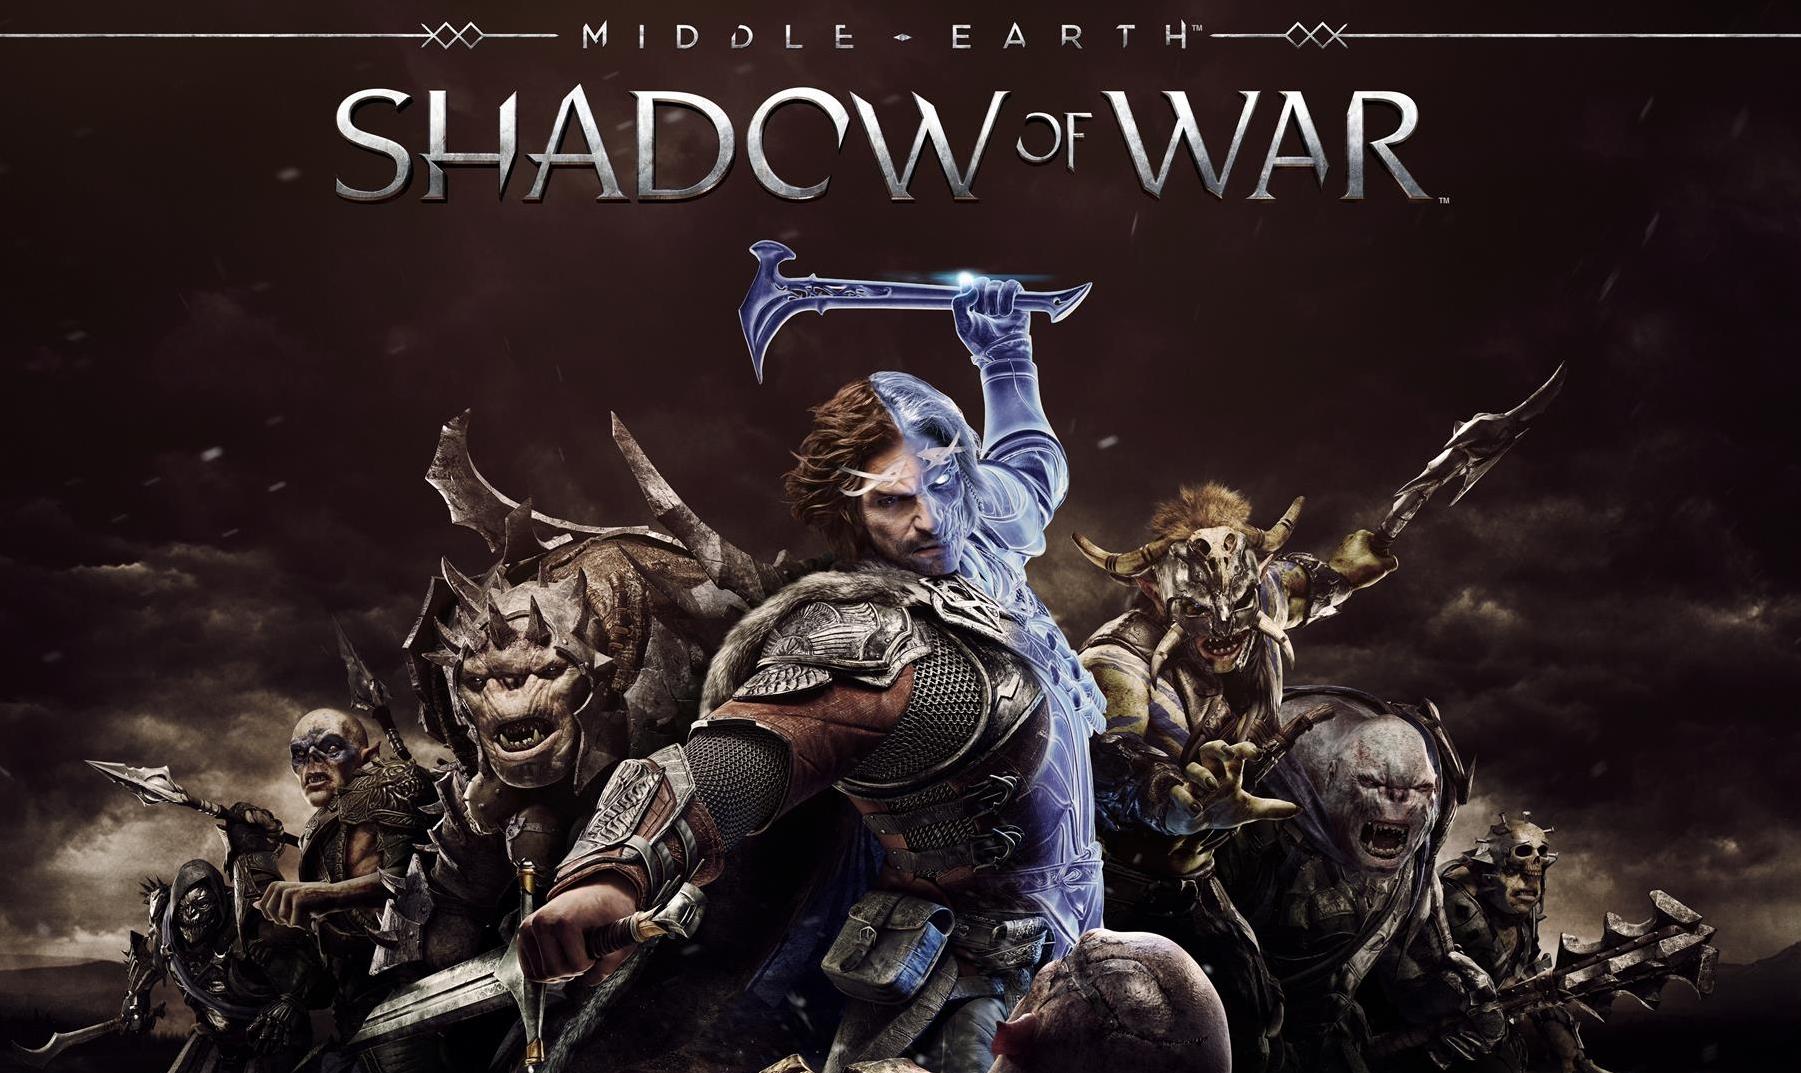 Darmowy weekend z grą Middle-earth: Shadow of War na Steam